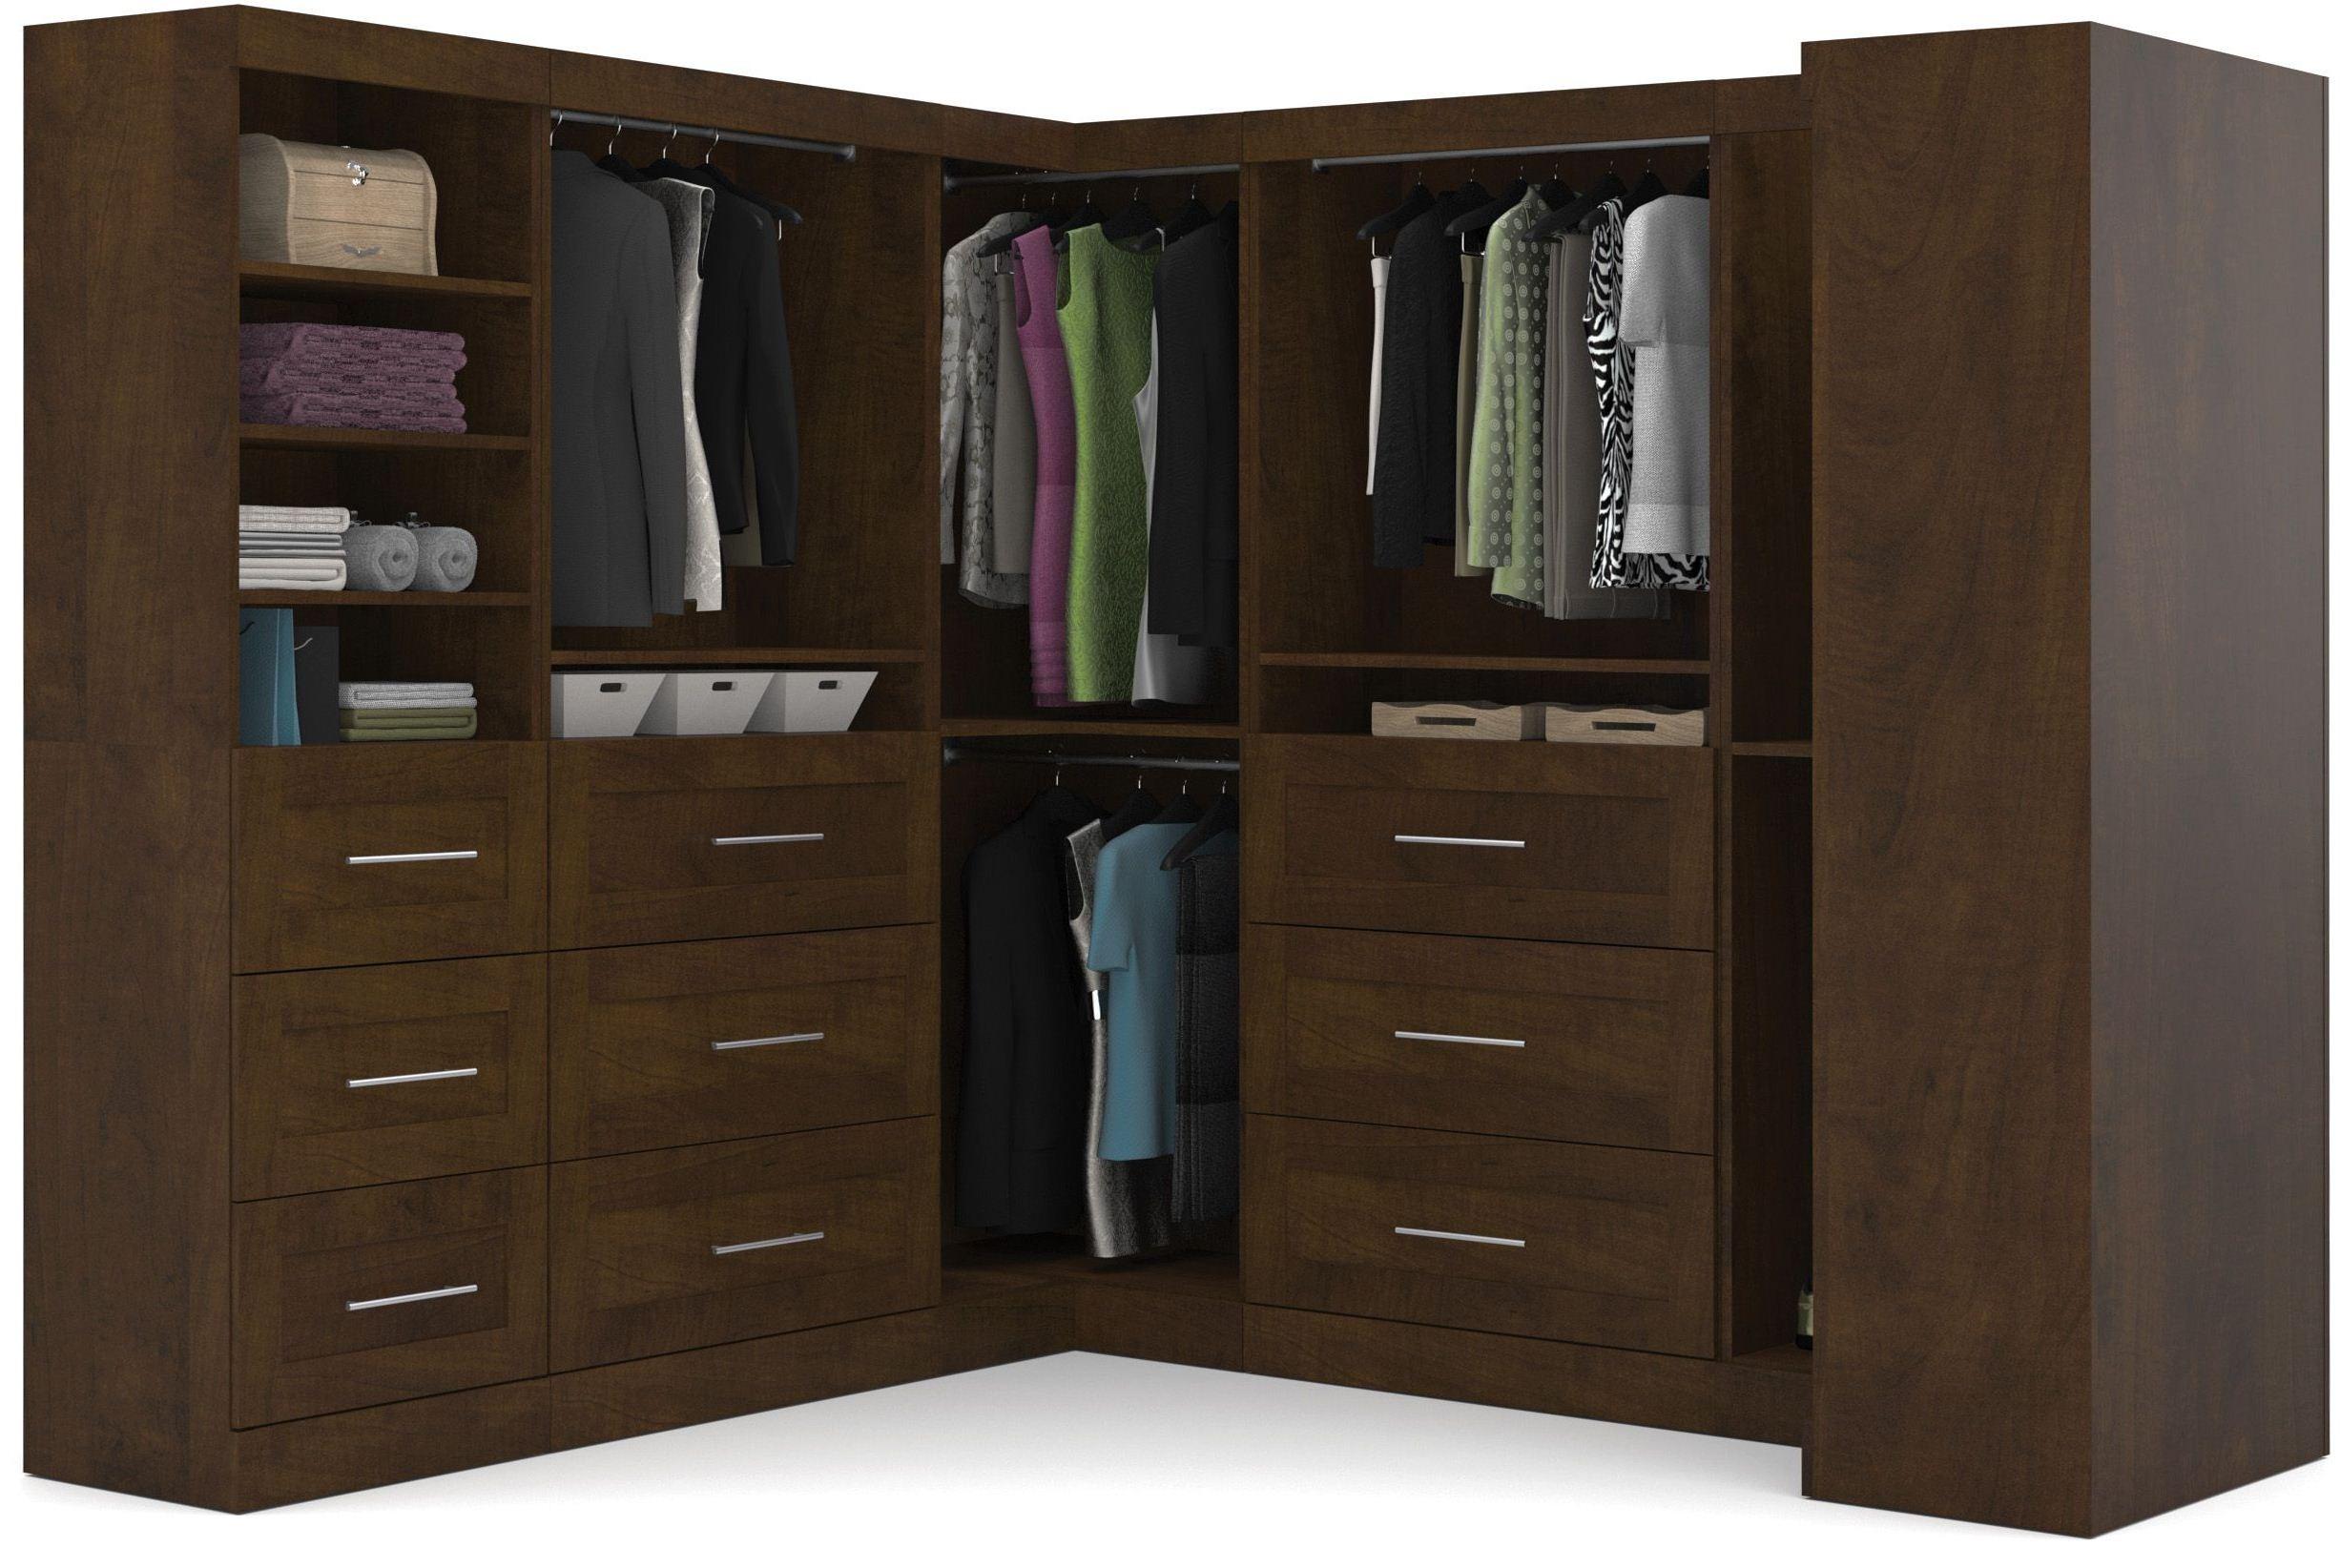 pur chocolate 100 optimum l shaped wardrobe from bestar. Black Bedroom Furniture Sets. Home Design Ideas